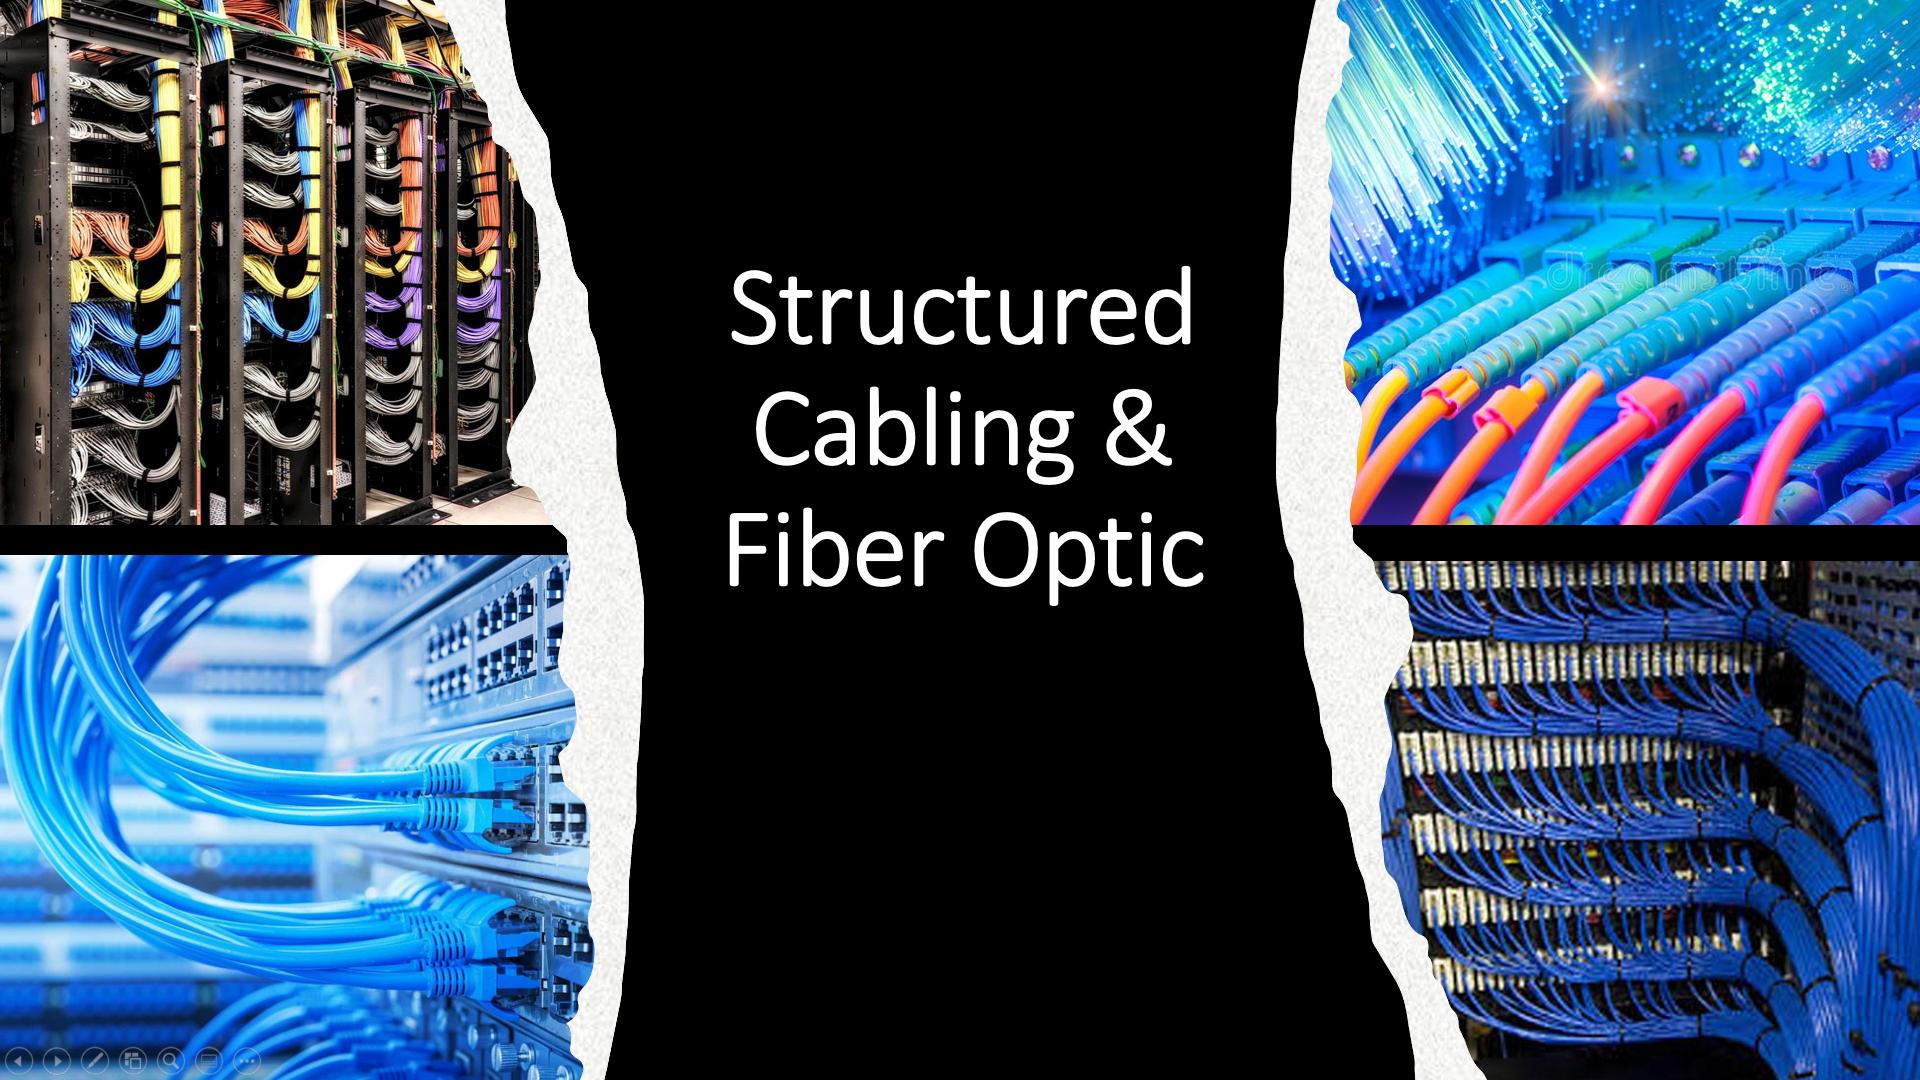 Structured Cabling & Fiber Optic